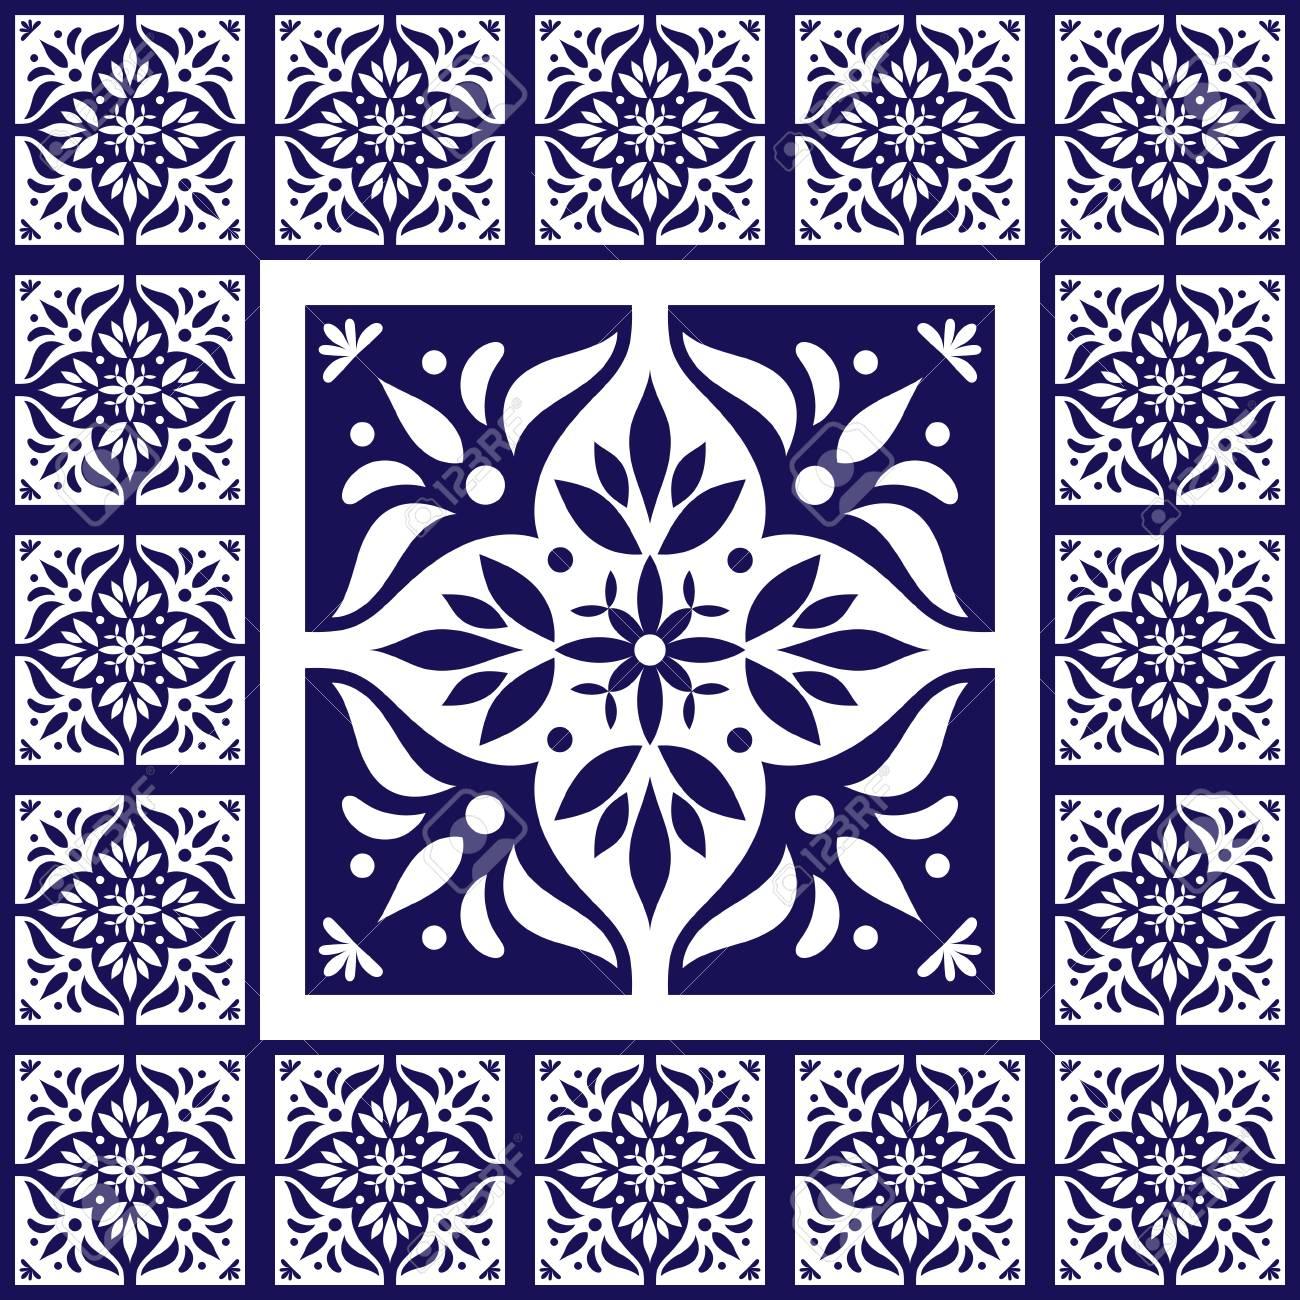 blue white tiles floor pattern vector with ceramic cement tiles